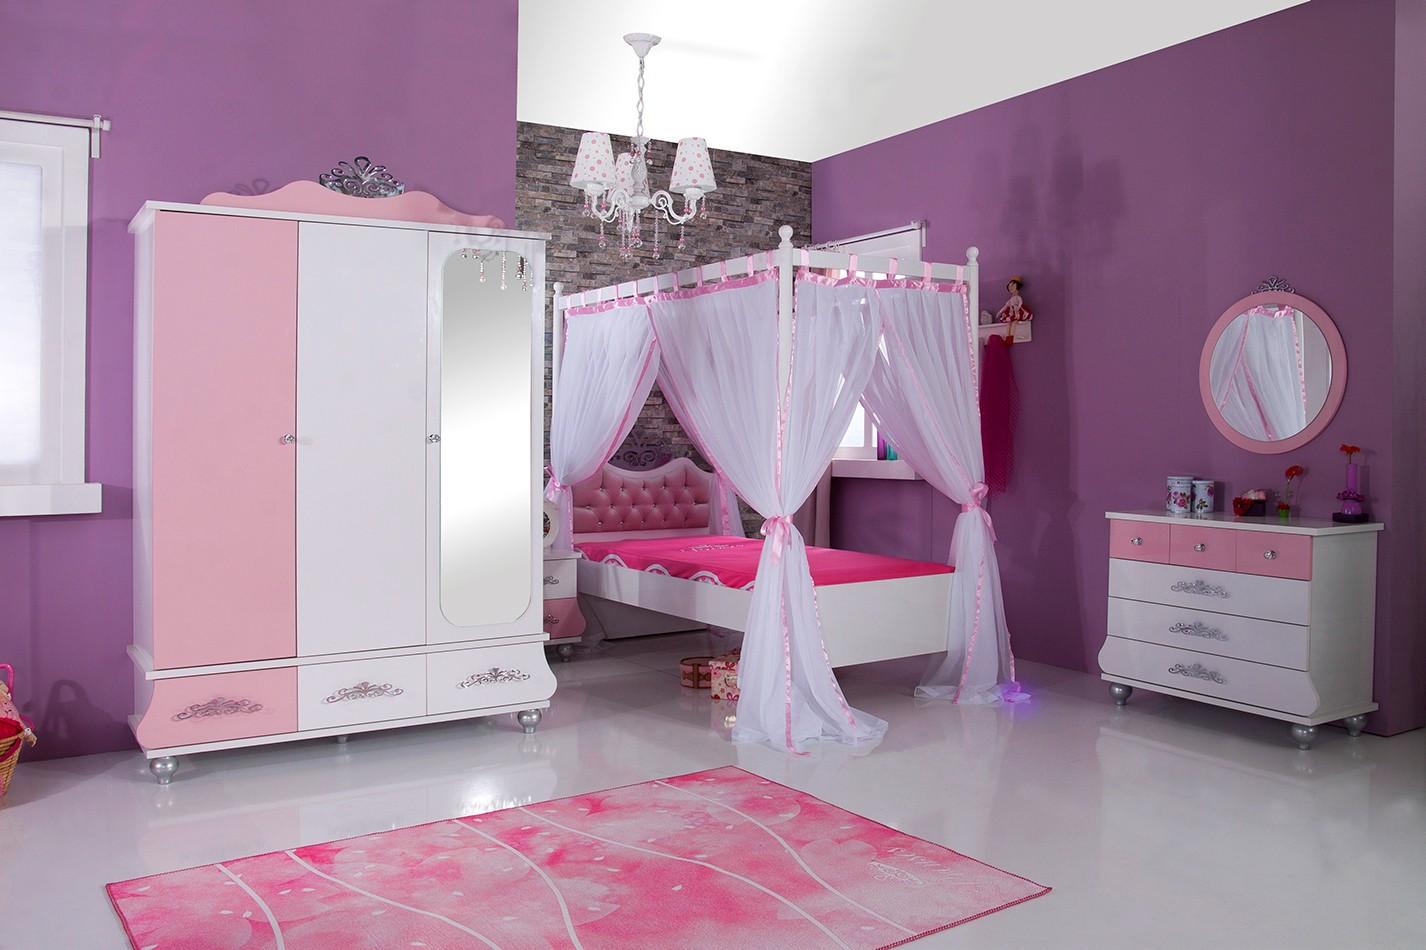 Prinsessenkamer roze 3 delige aanbiedingsset kinderkamer kinderbed terrashaard en barbecues - Roze kleine kamer ...